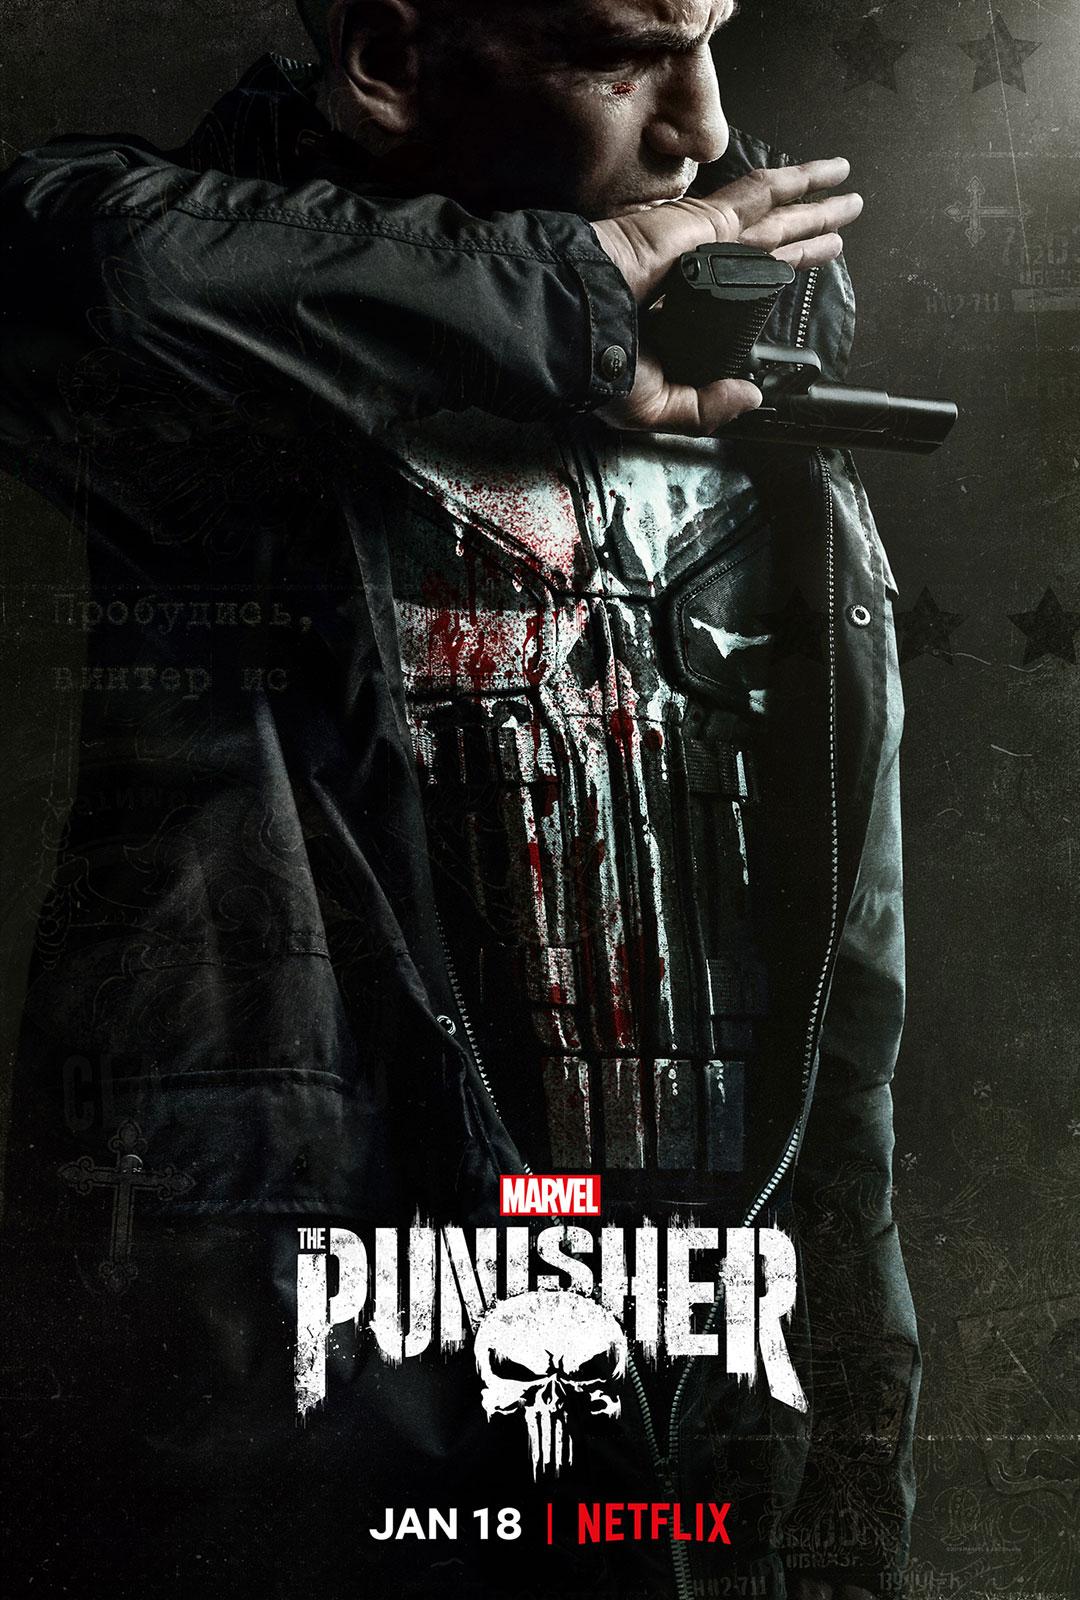 Marvels The Punisher